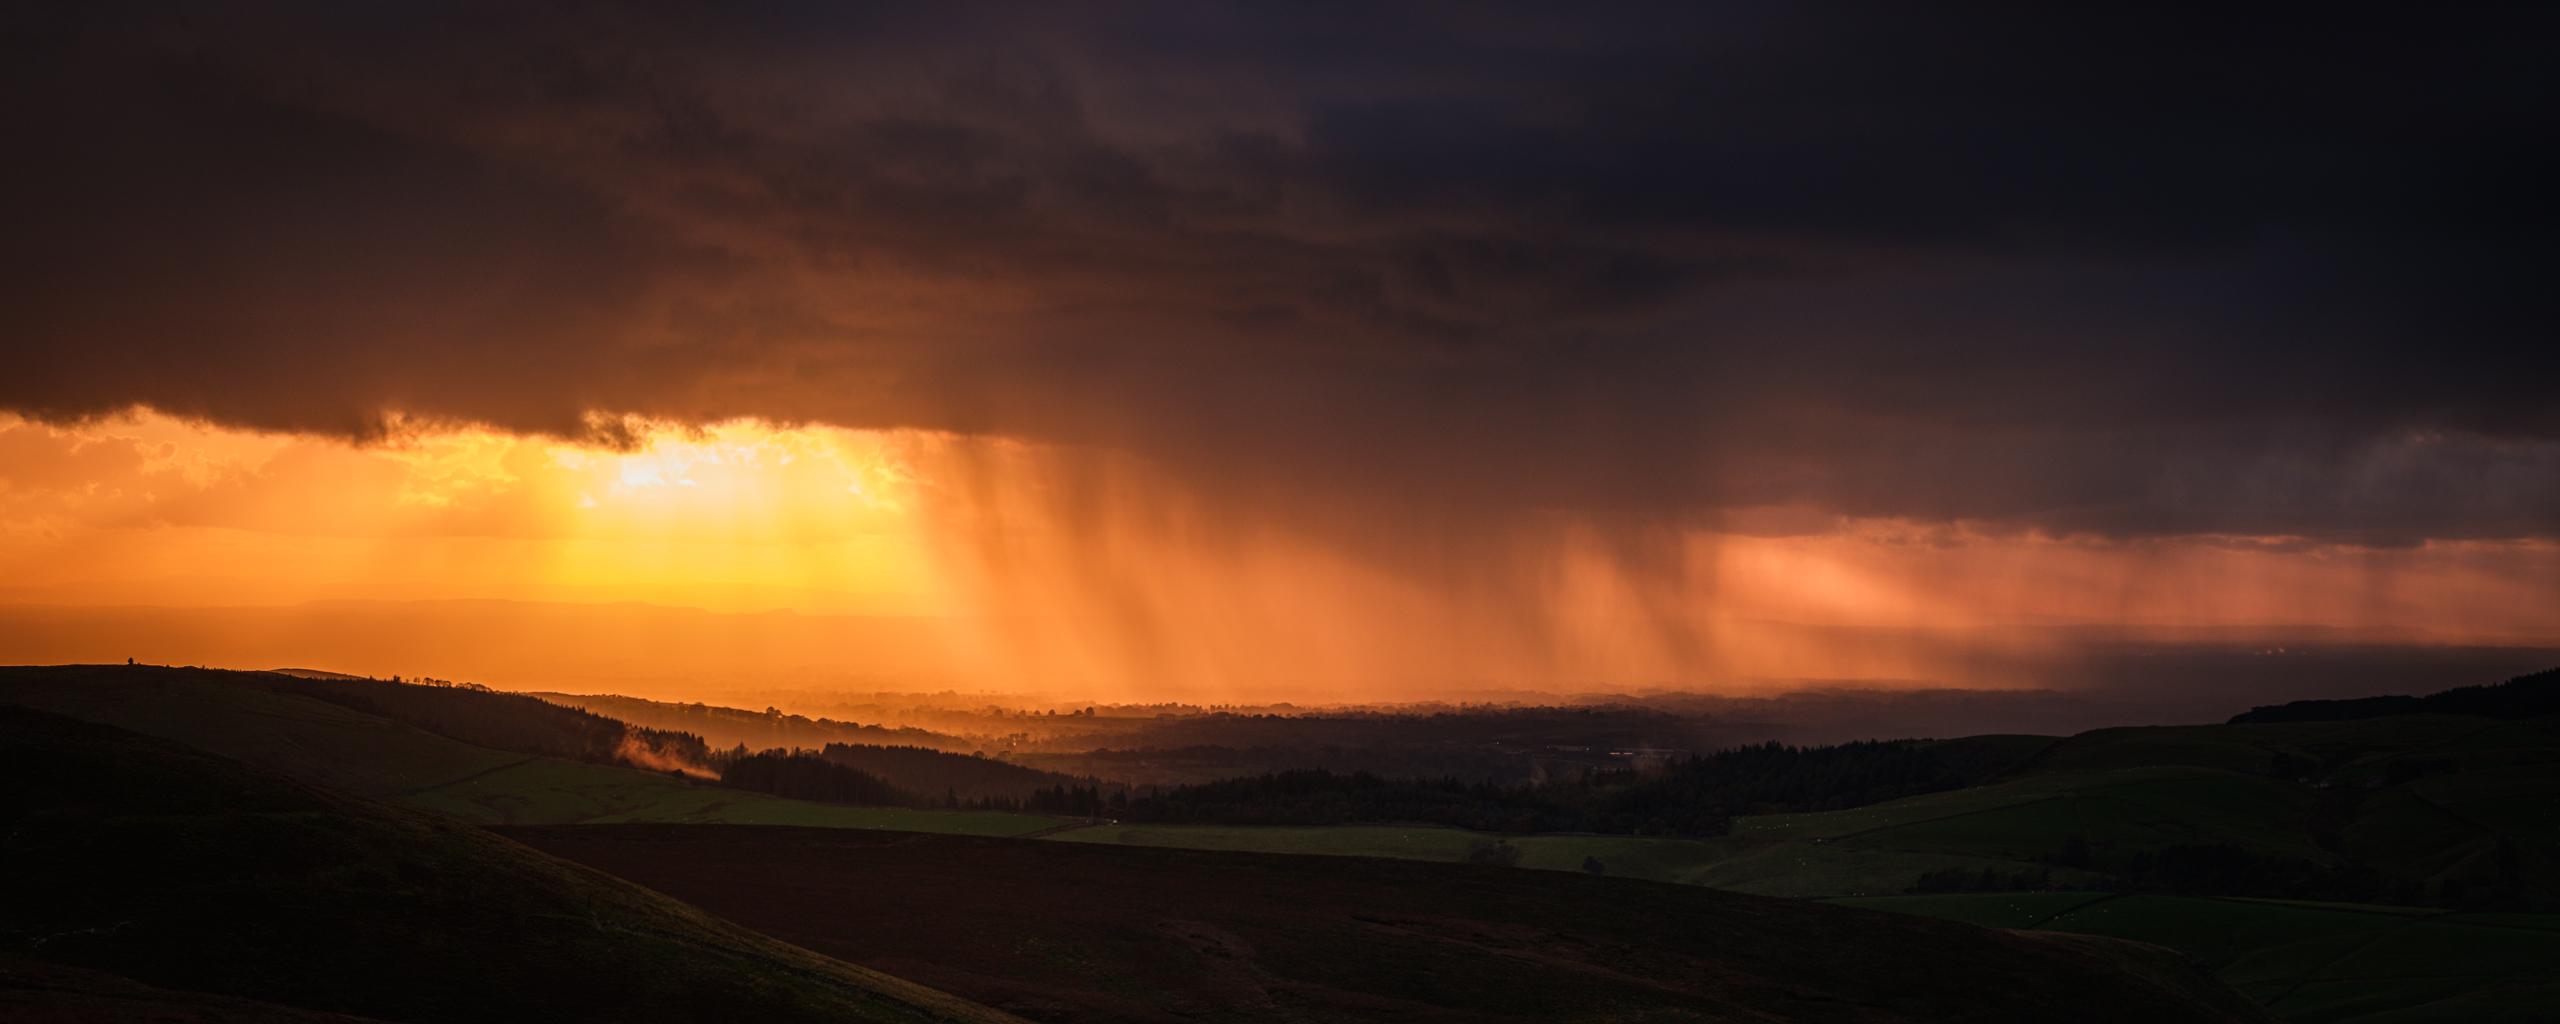 Rain storm over Macclesfield